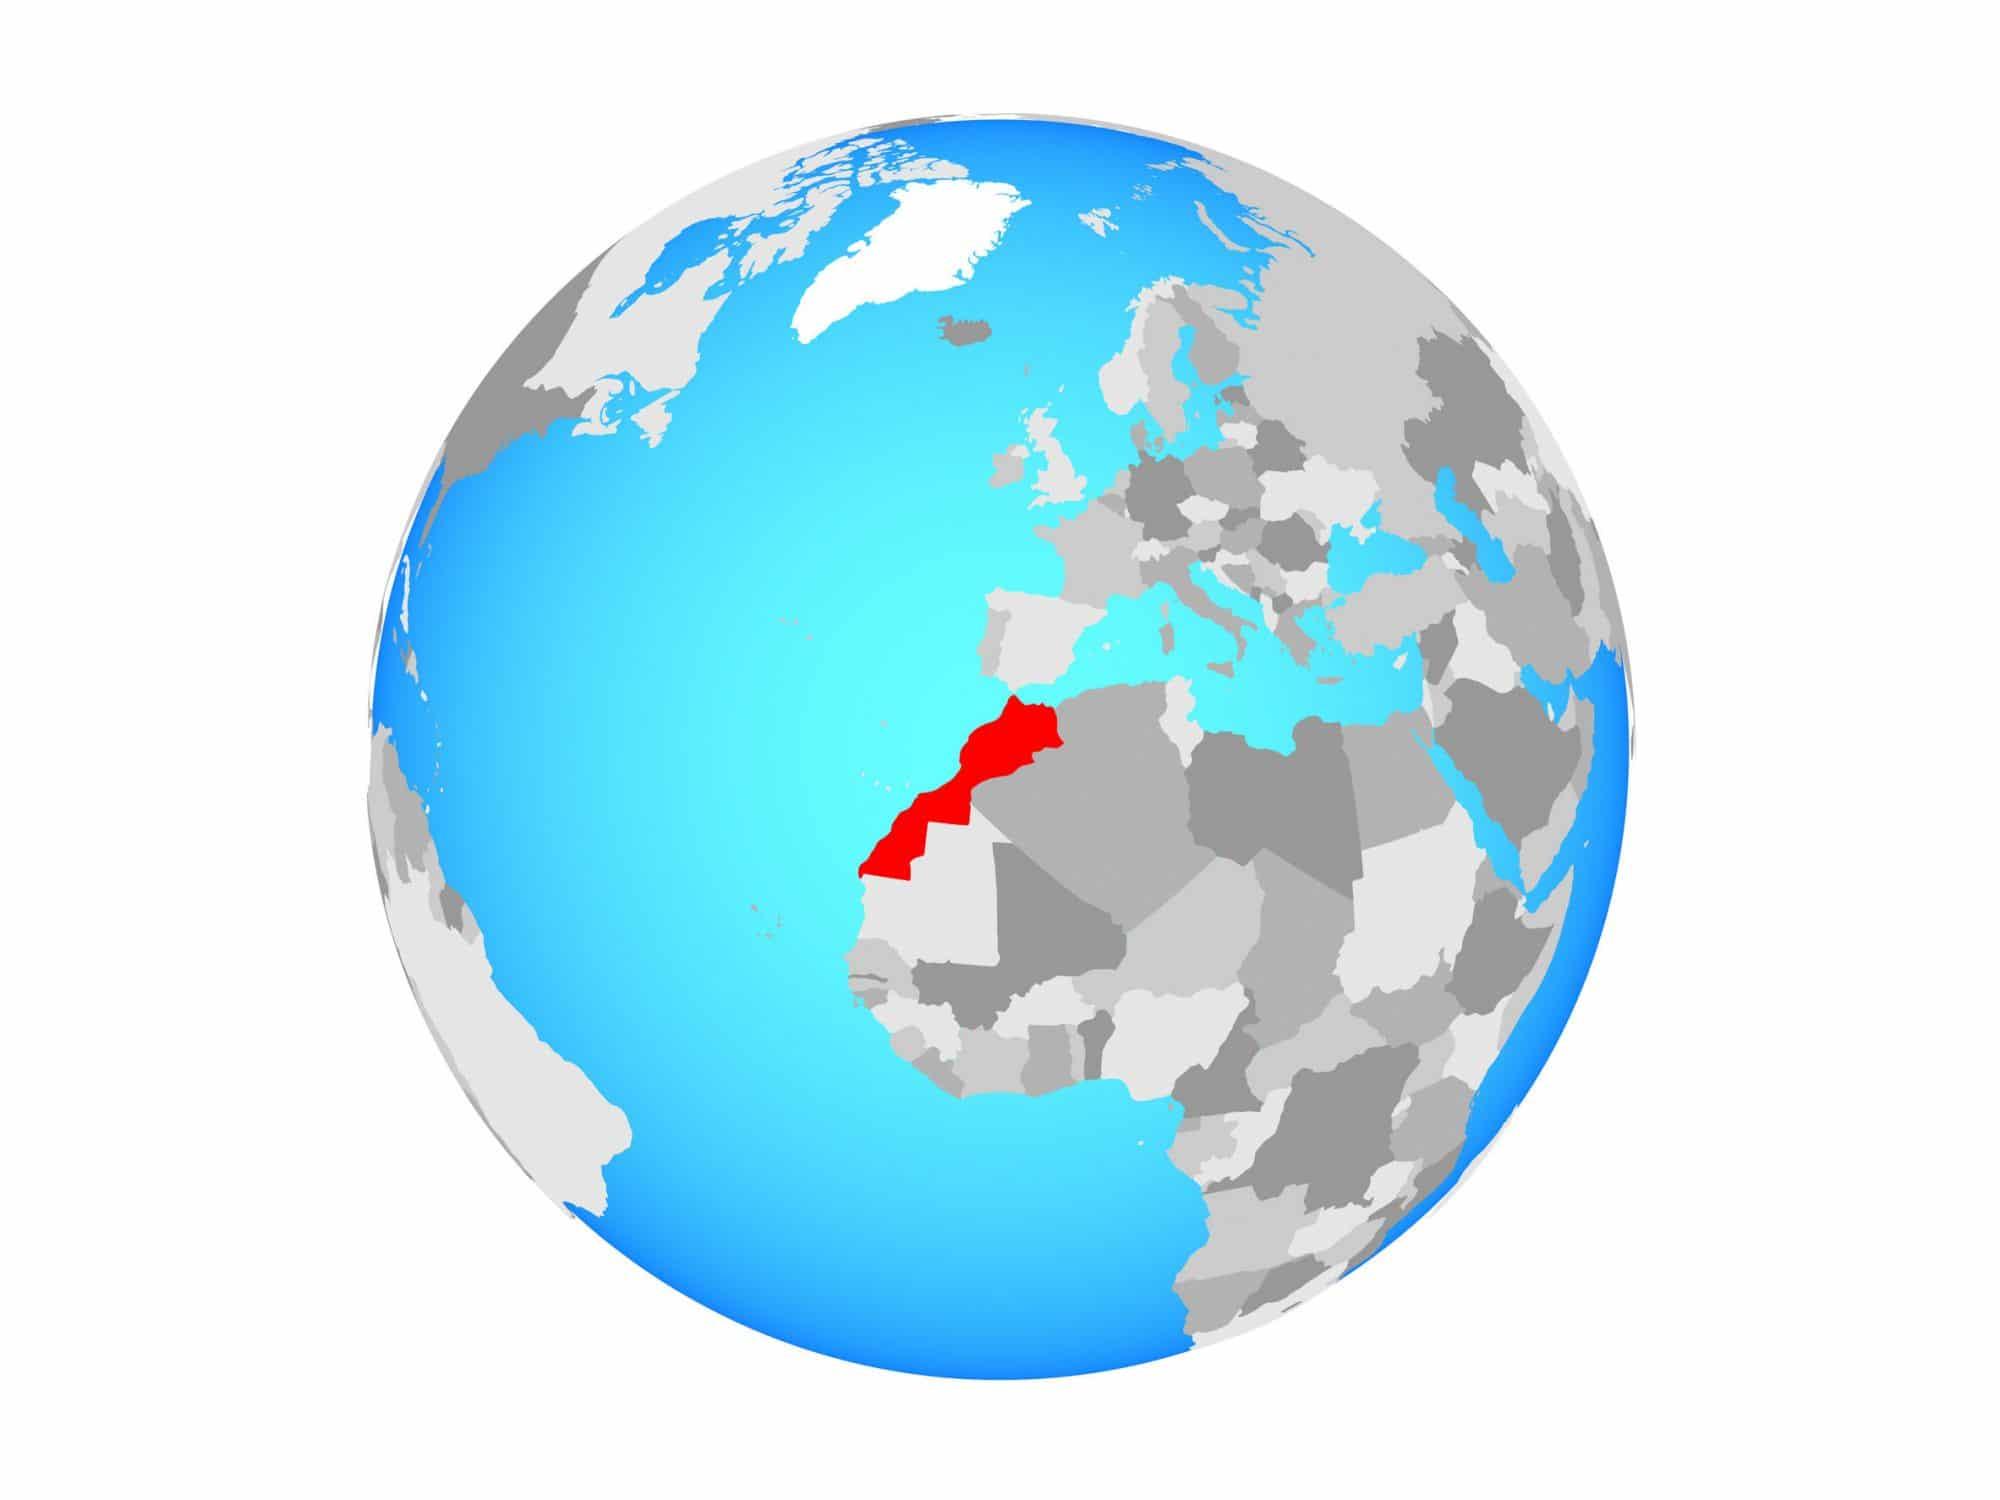 Marruecos en un mapa mundi